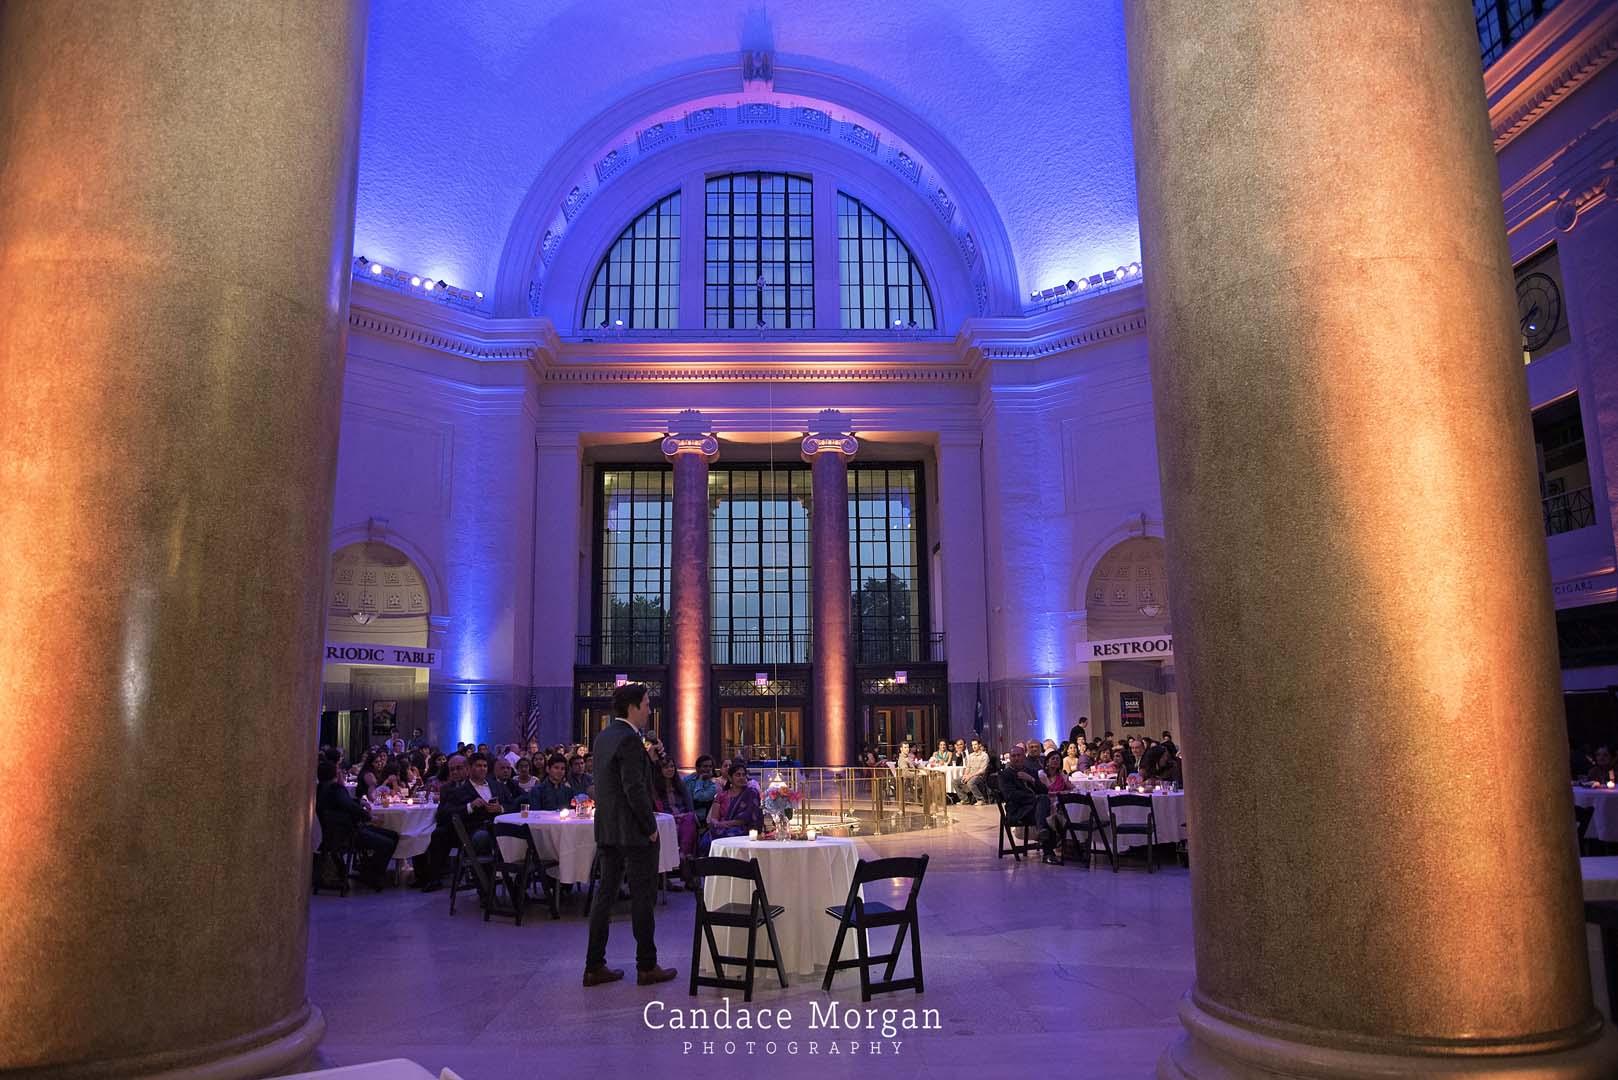 Wedding and event uplighting science museum richmond virginia